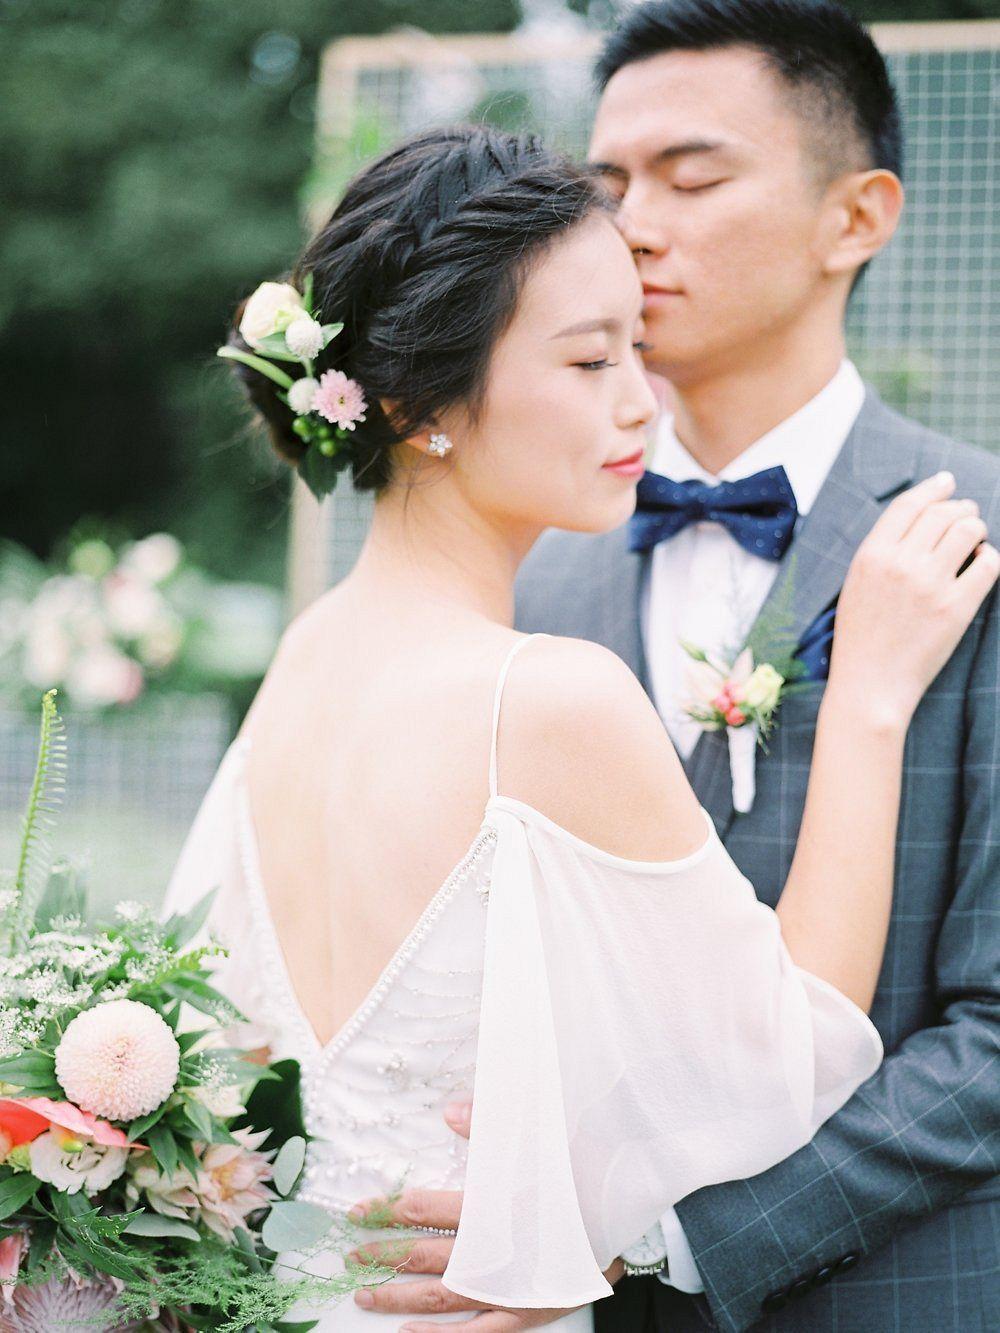 Western style chinese wedding weddings couples pinterest